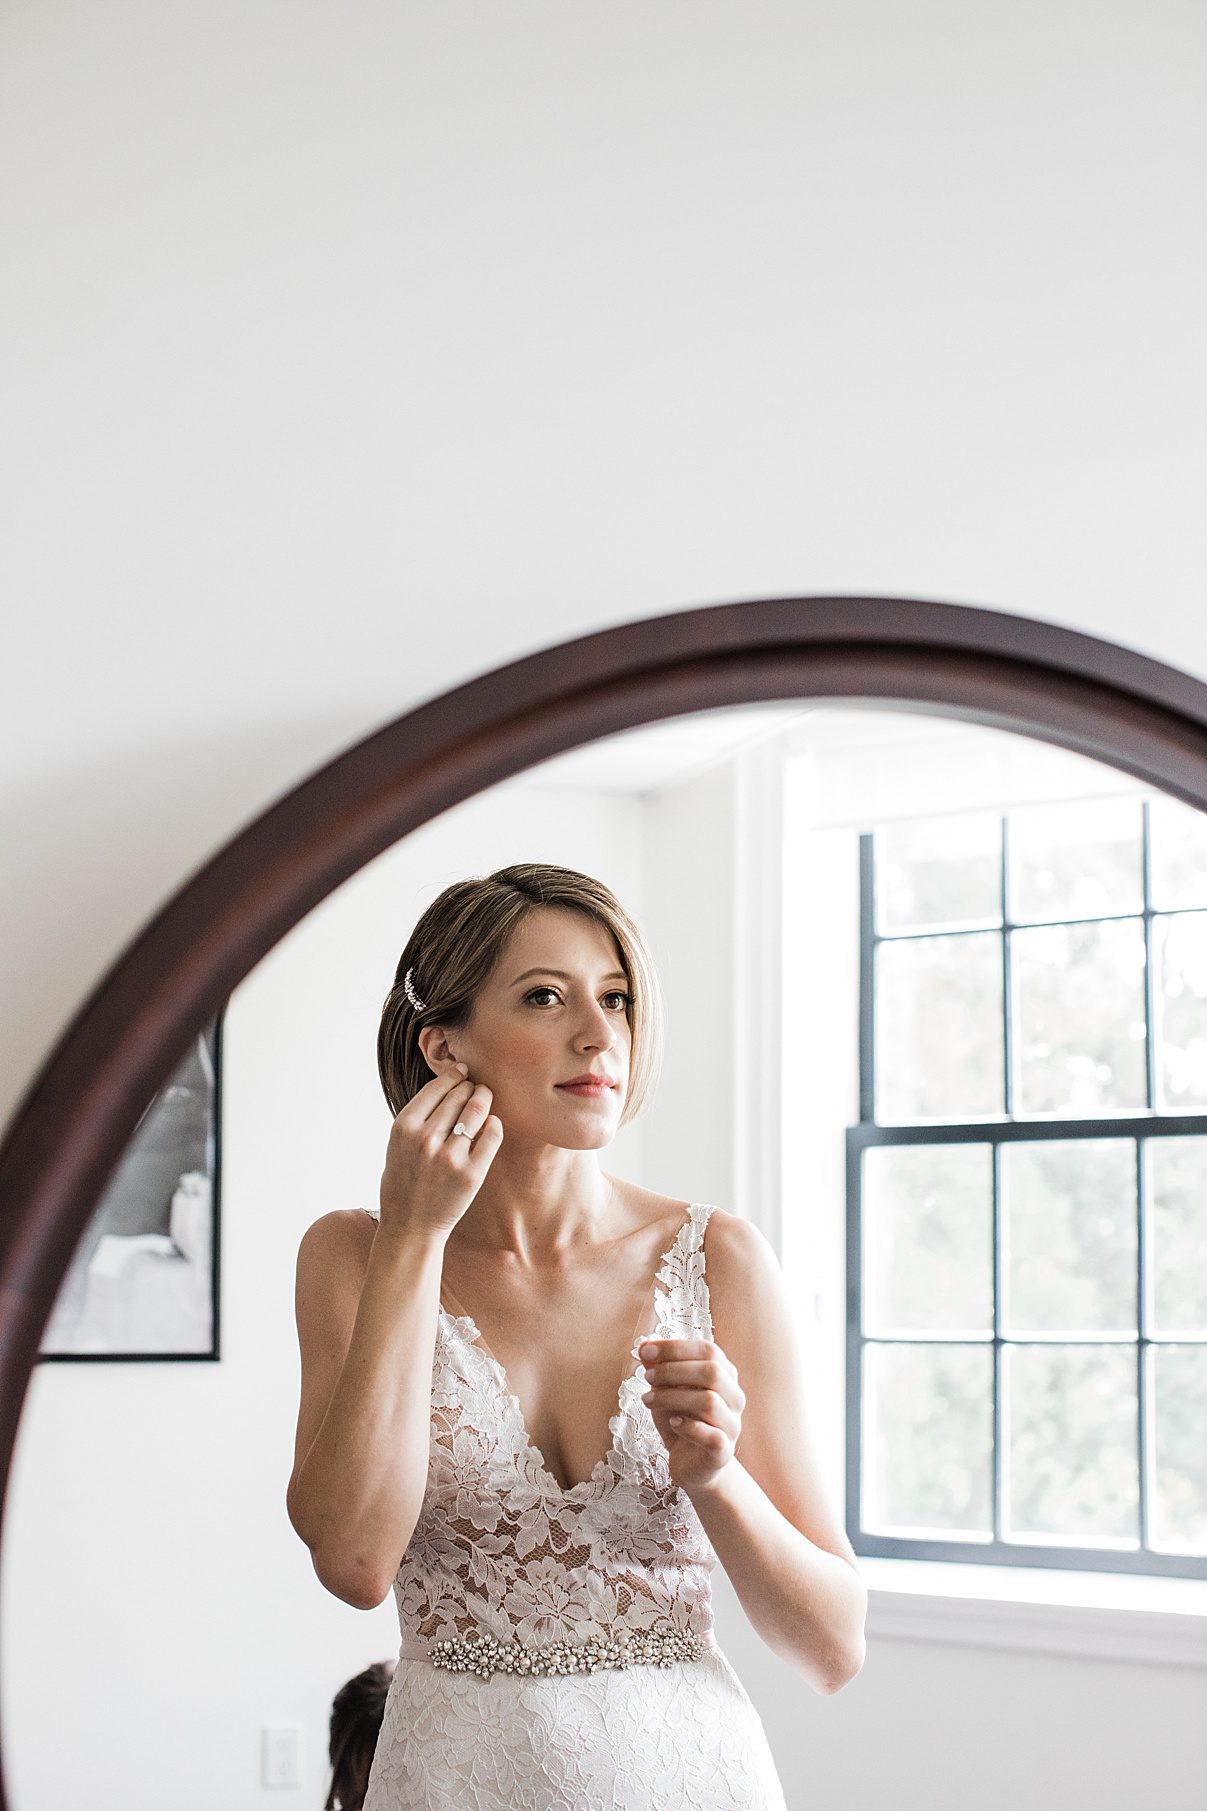 Bride putting earrings on in mirror| Harding Waterfront Estate Wedding| Ontario wedding photographer| Toronto wedding photographer| 3 Photography | 3photography.ca